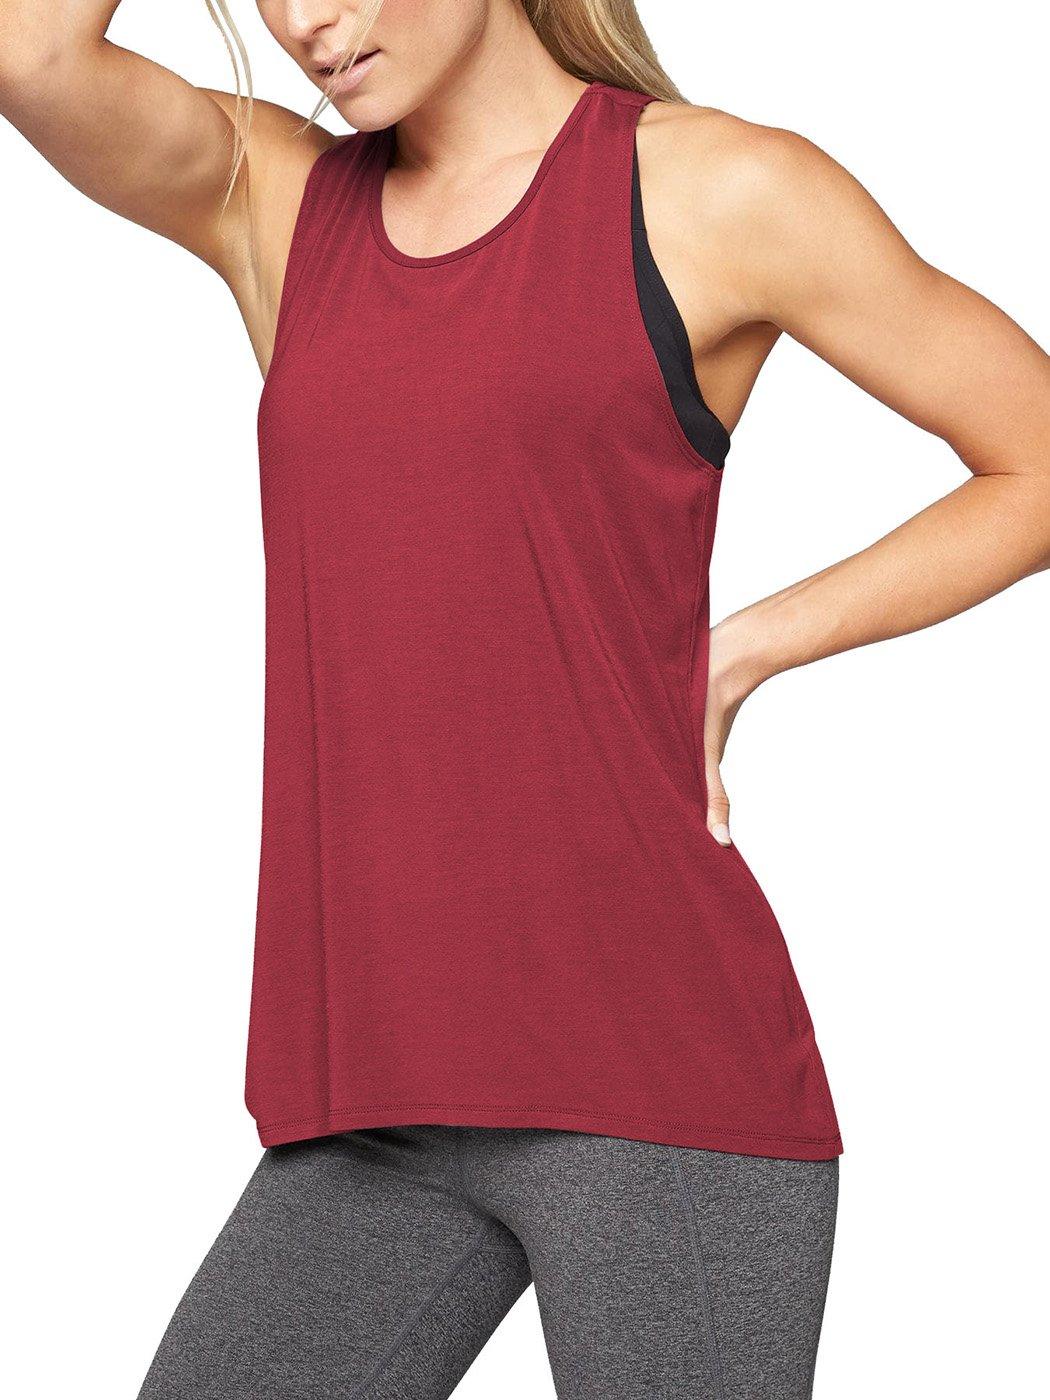 Bestisun Women's Yoga Tank Top Workout Sport Shirt Racerback T-Shirt Top Wine Red M by Bestisun (Image #2)